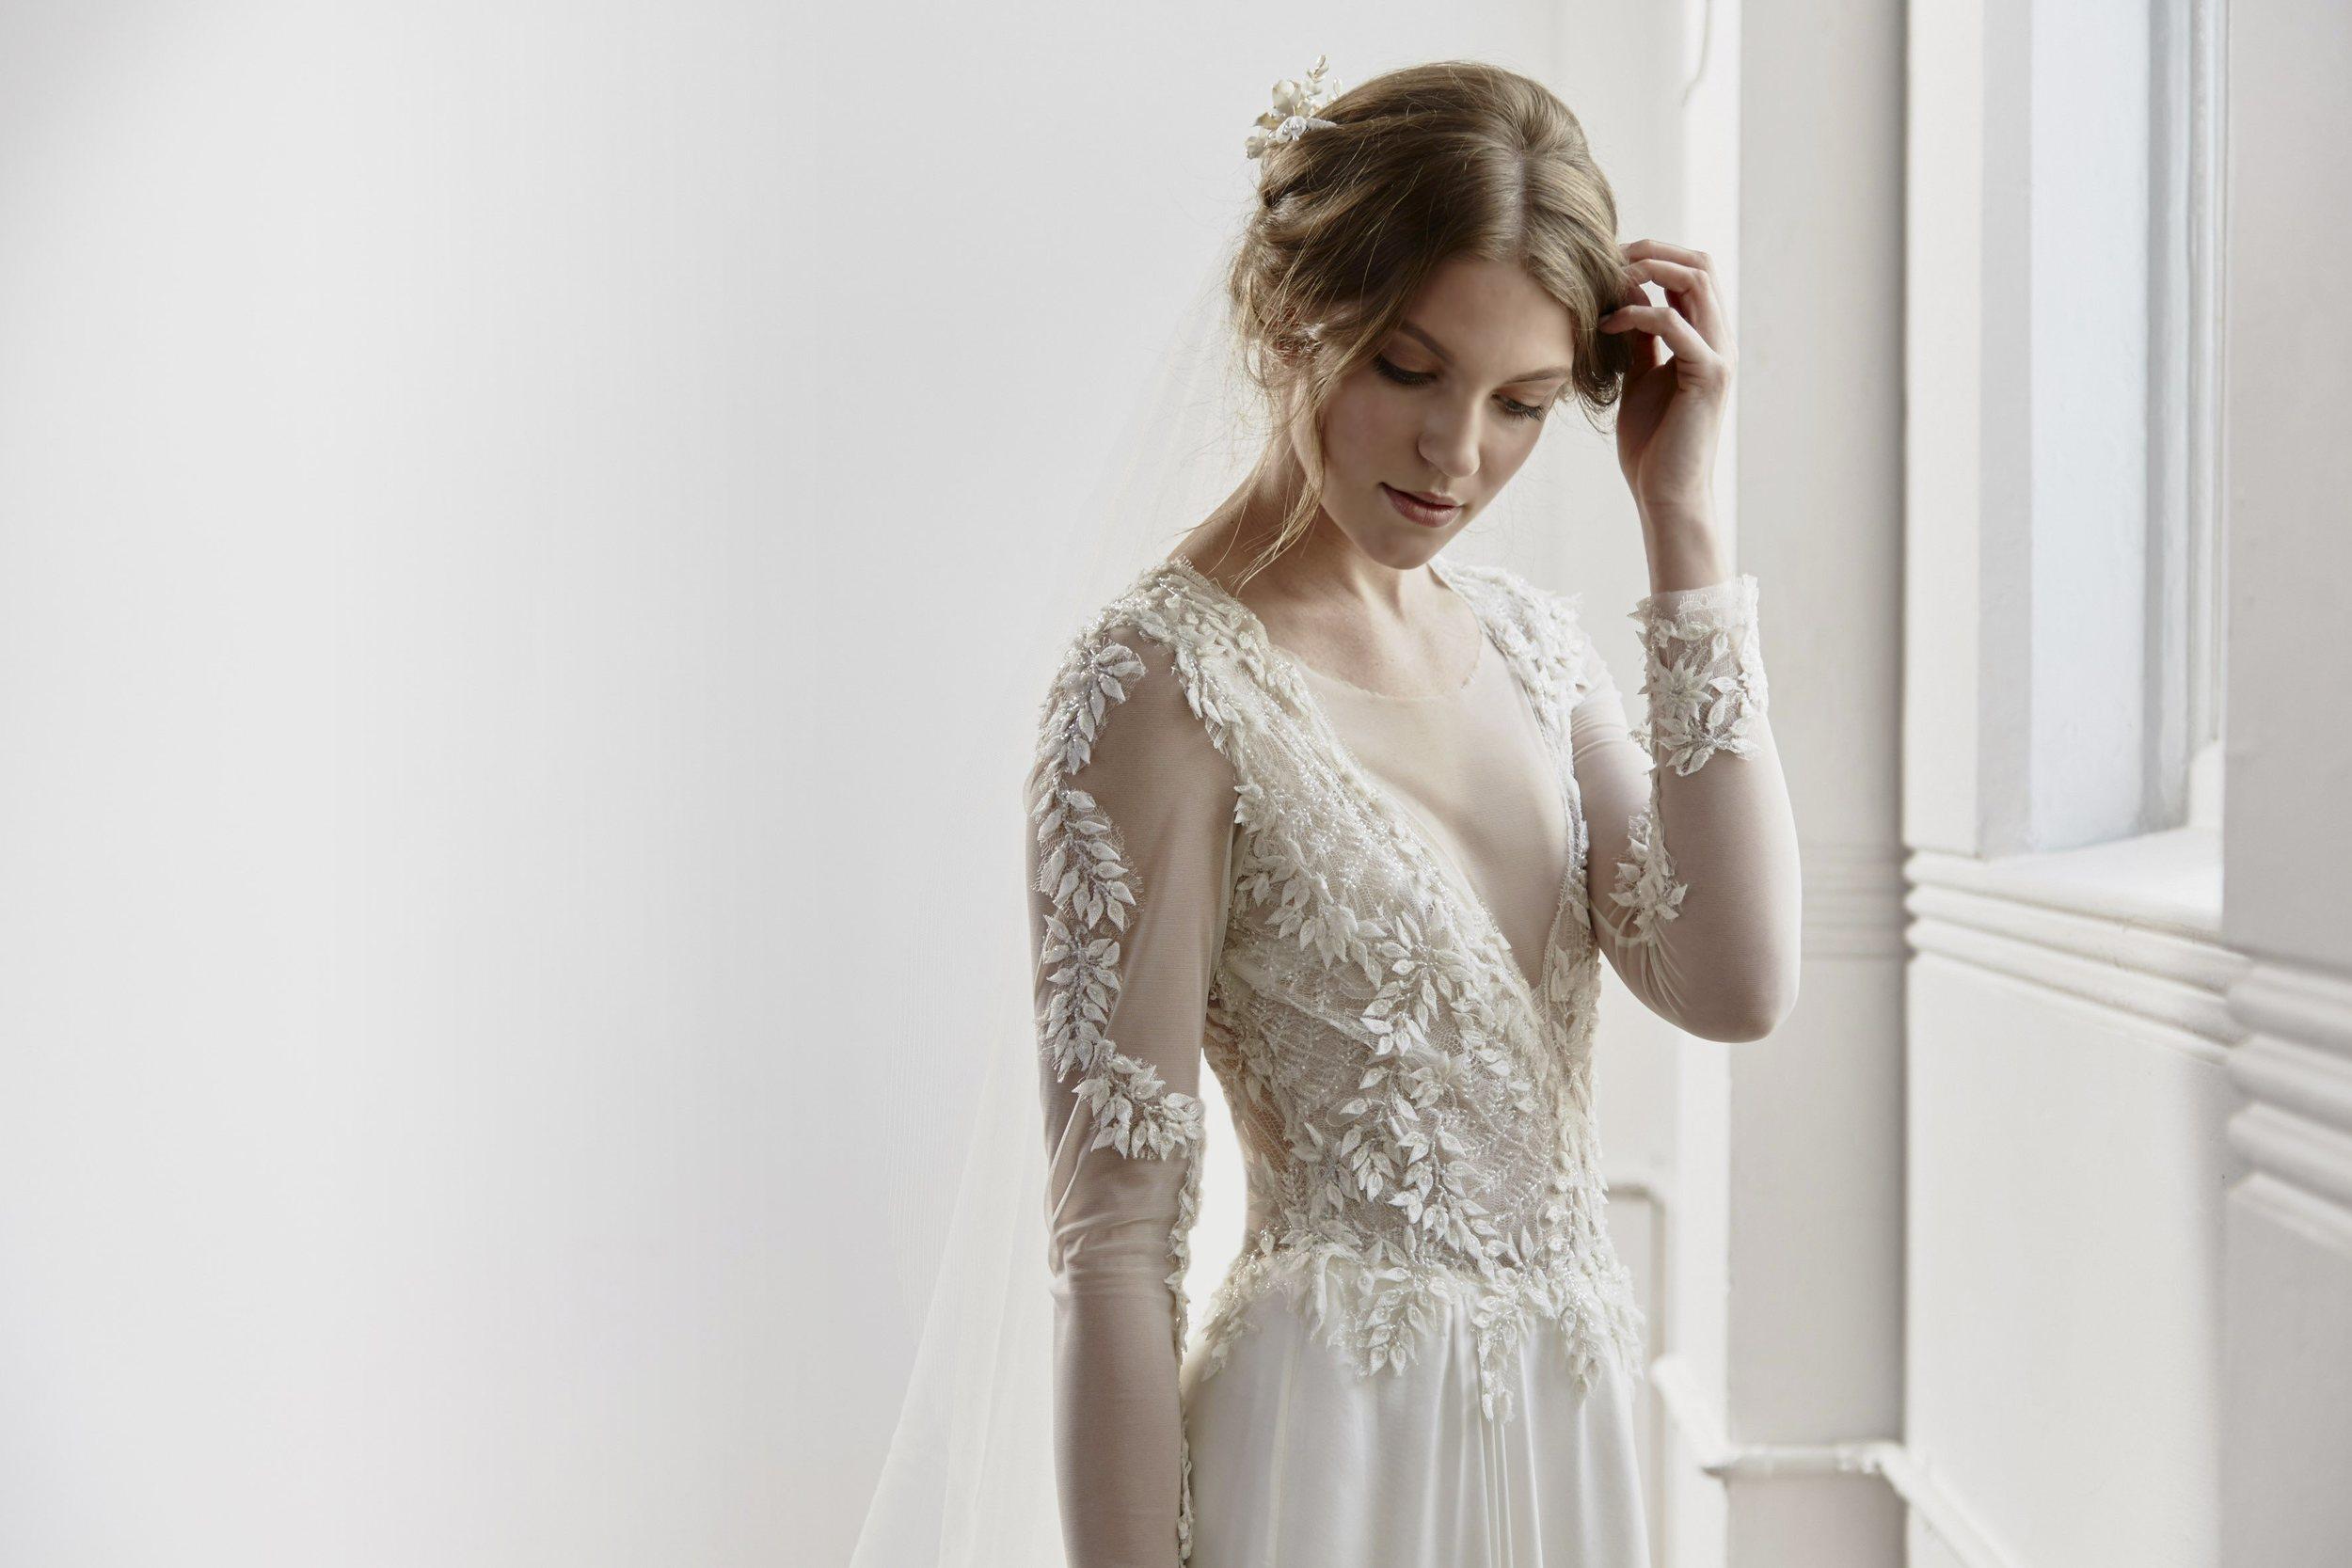 Willow_TanyaAnic_©GrantSparkesCarroll_012_Lowhero vintage inspired bride.jpg